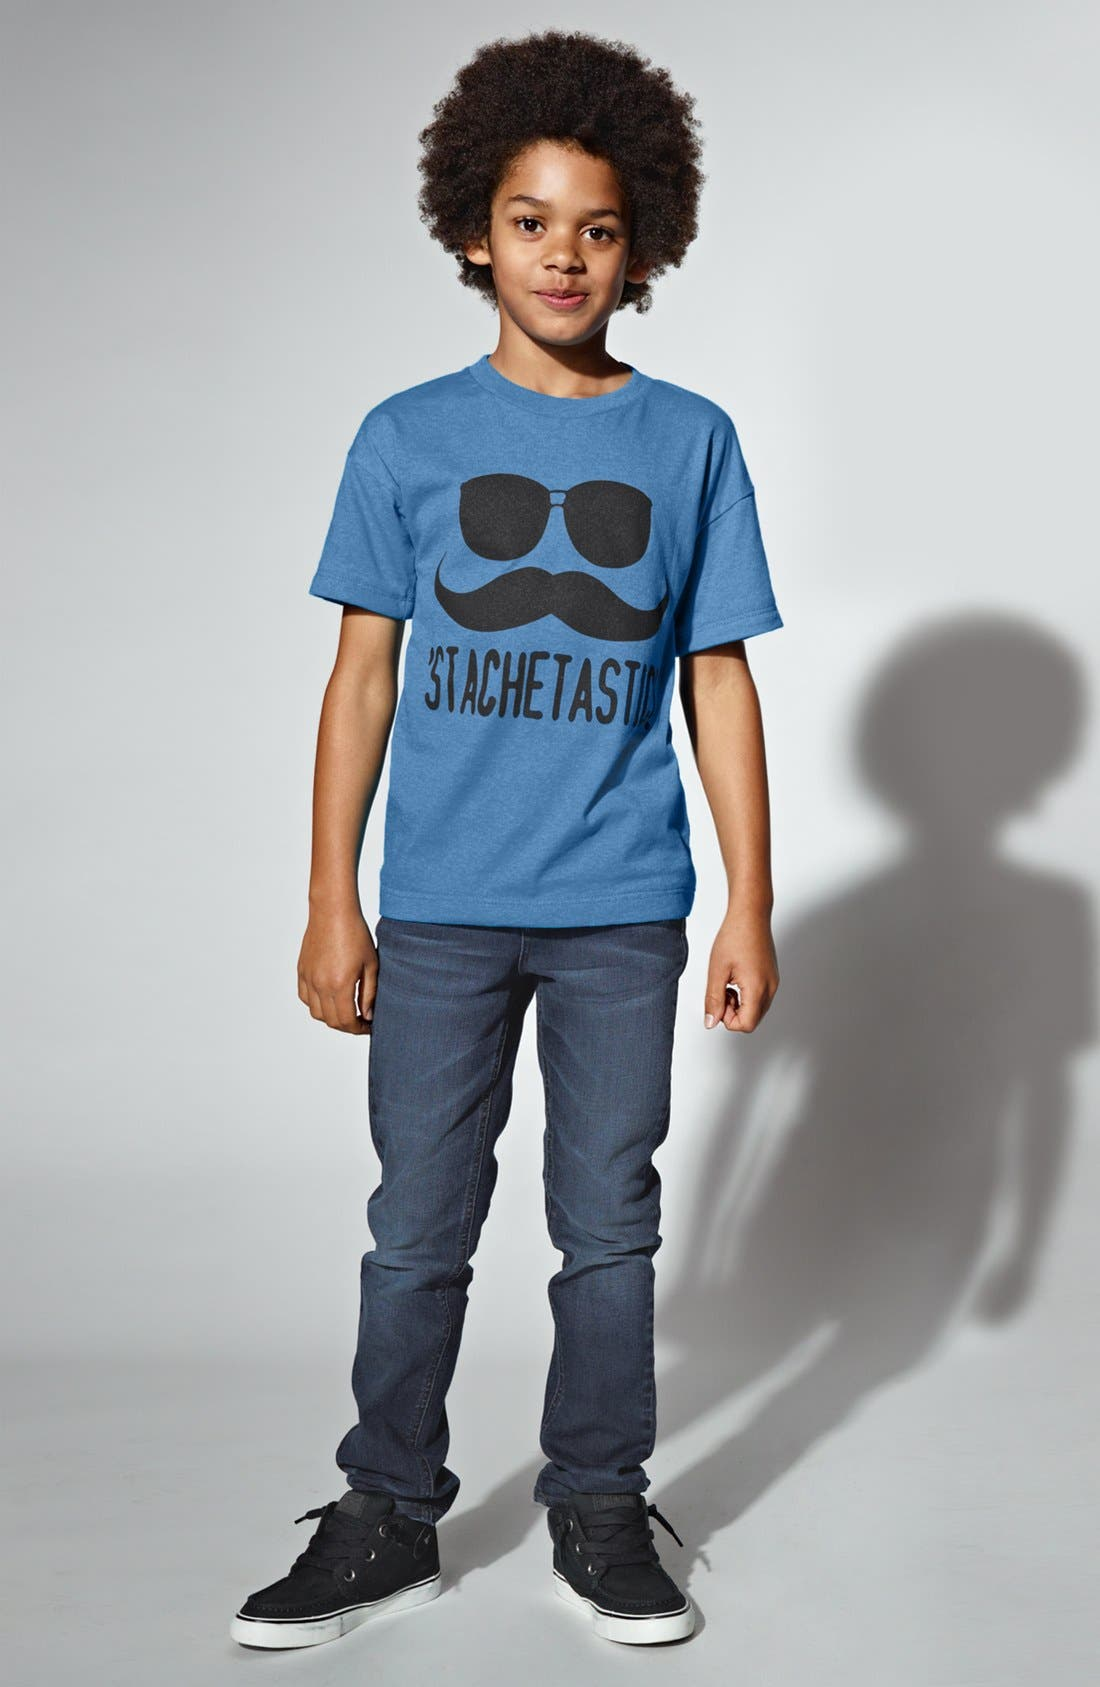 Main Image - Jem Screenprint T-Shirt & Joe's Jeans (Big Boys)